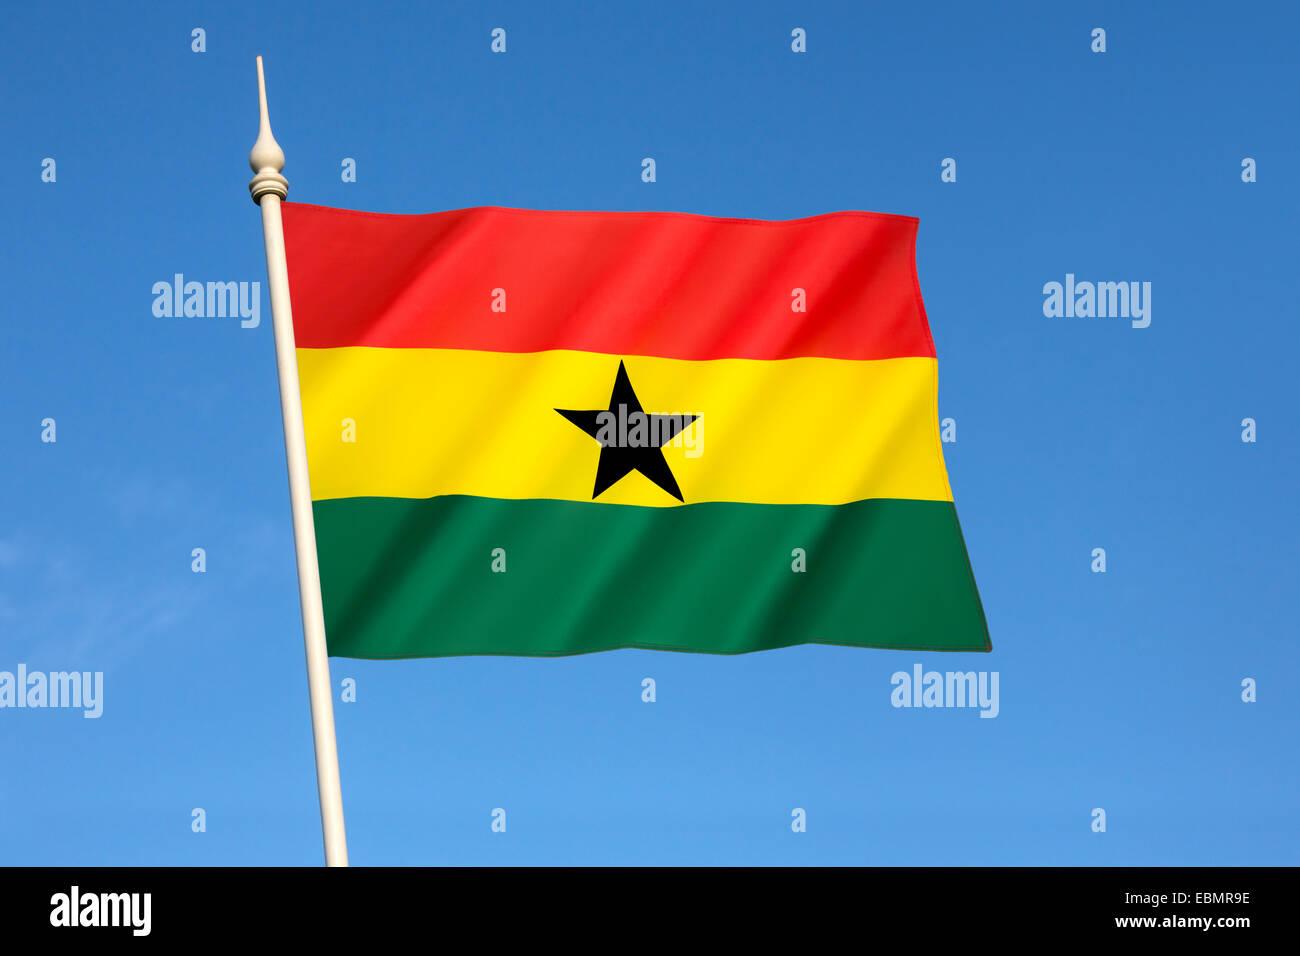 The flag of Ghana - Stock Image